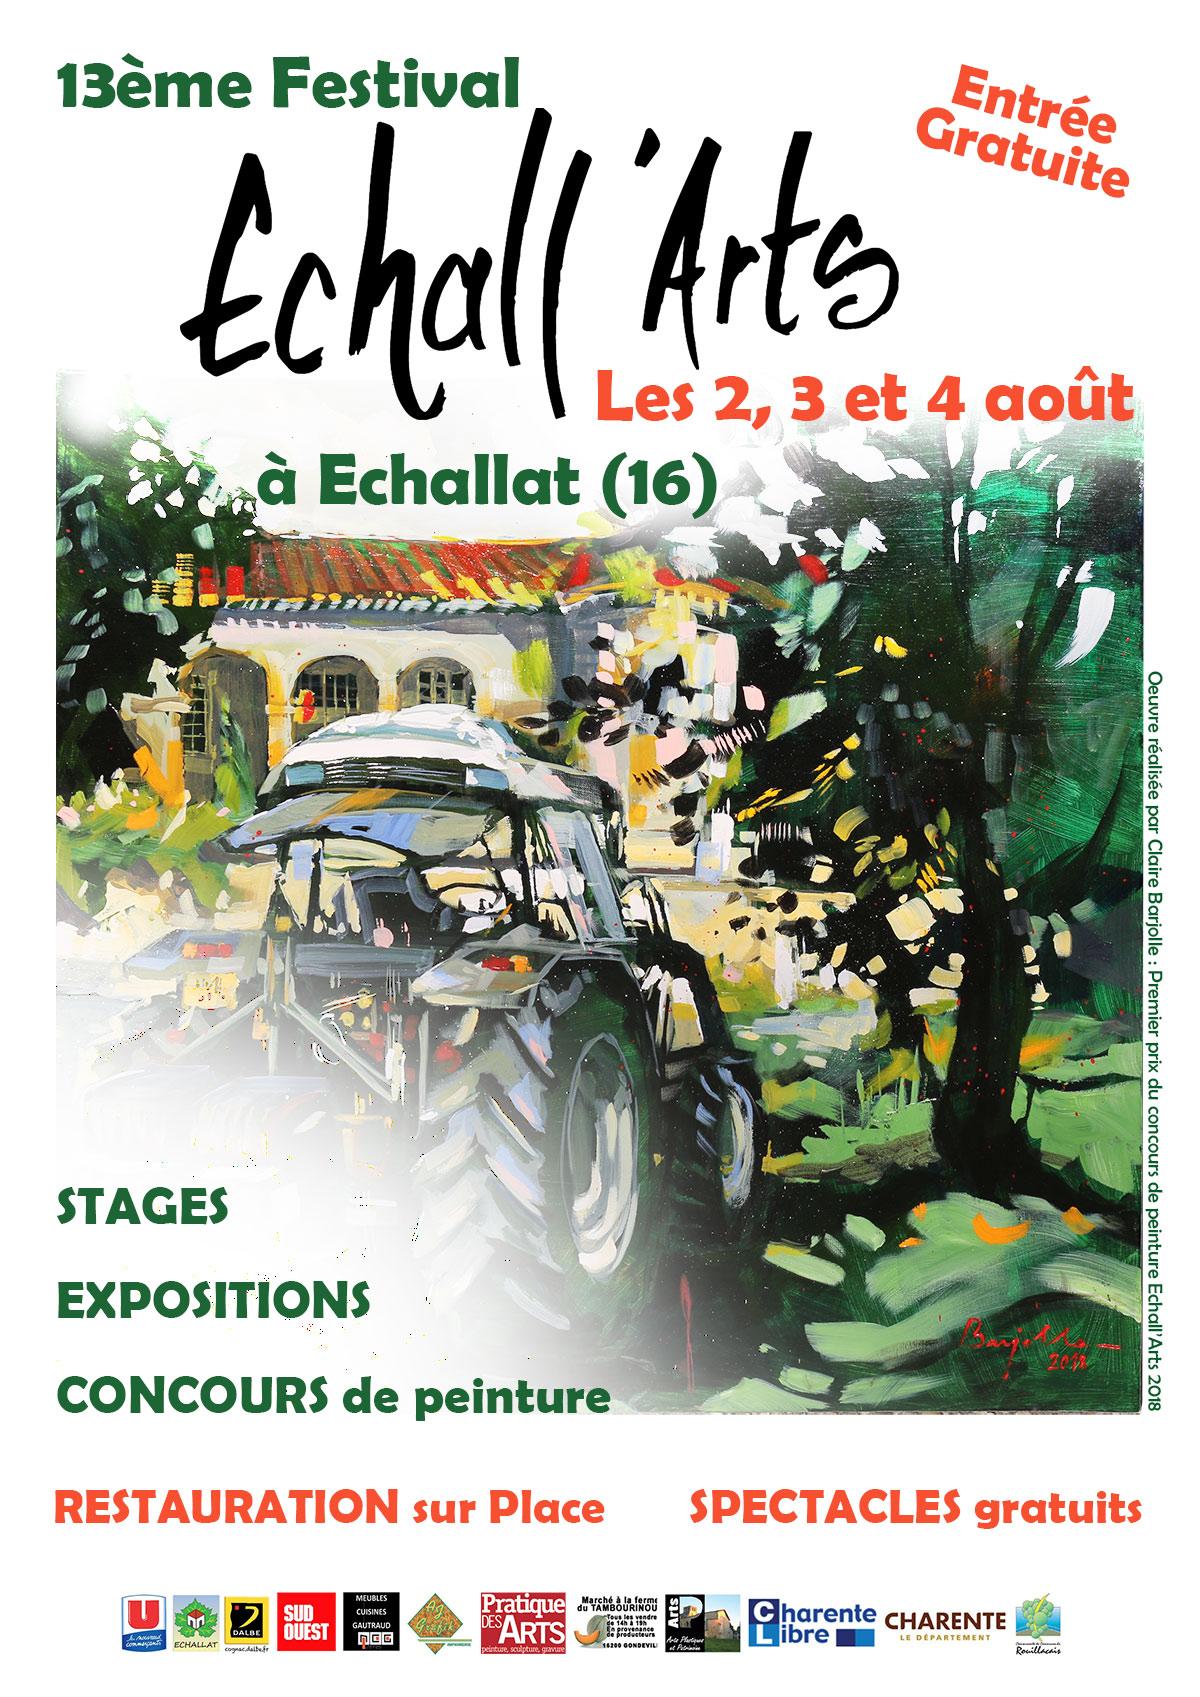 Echall'arts